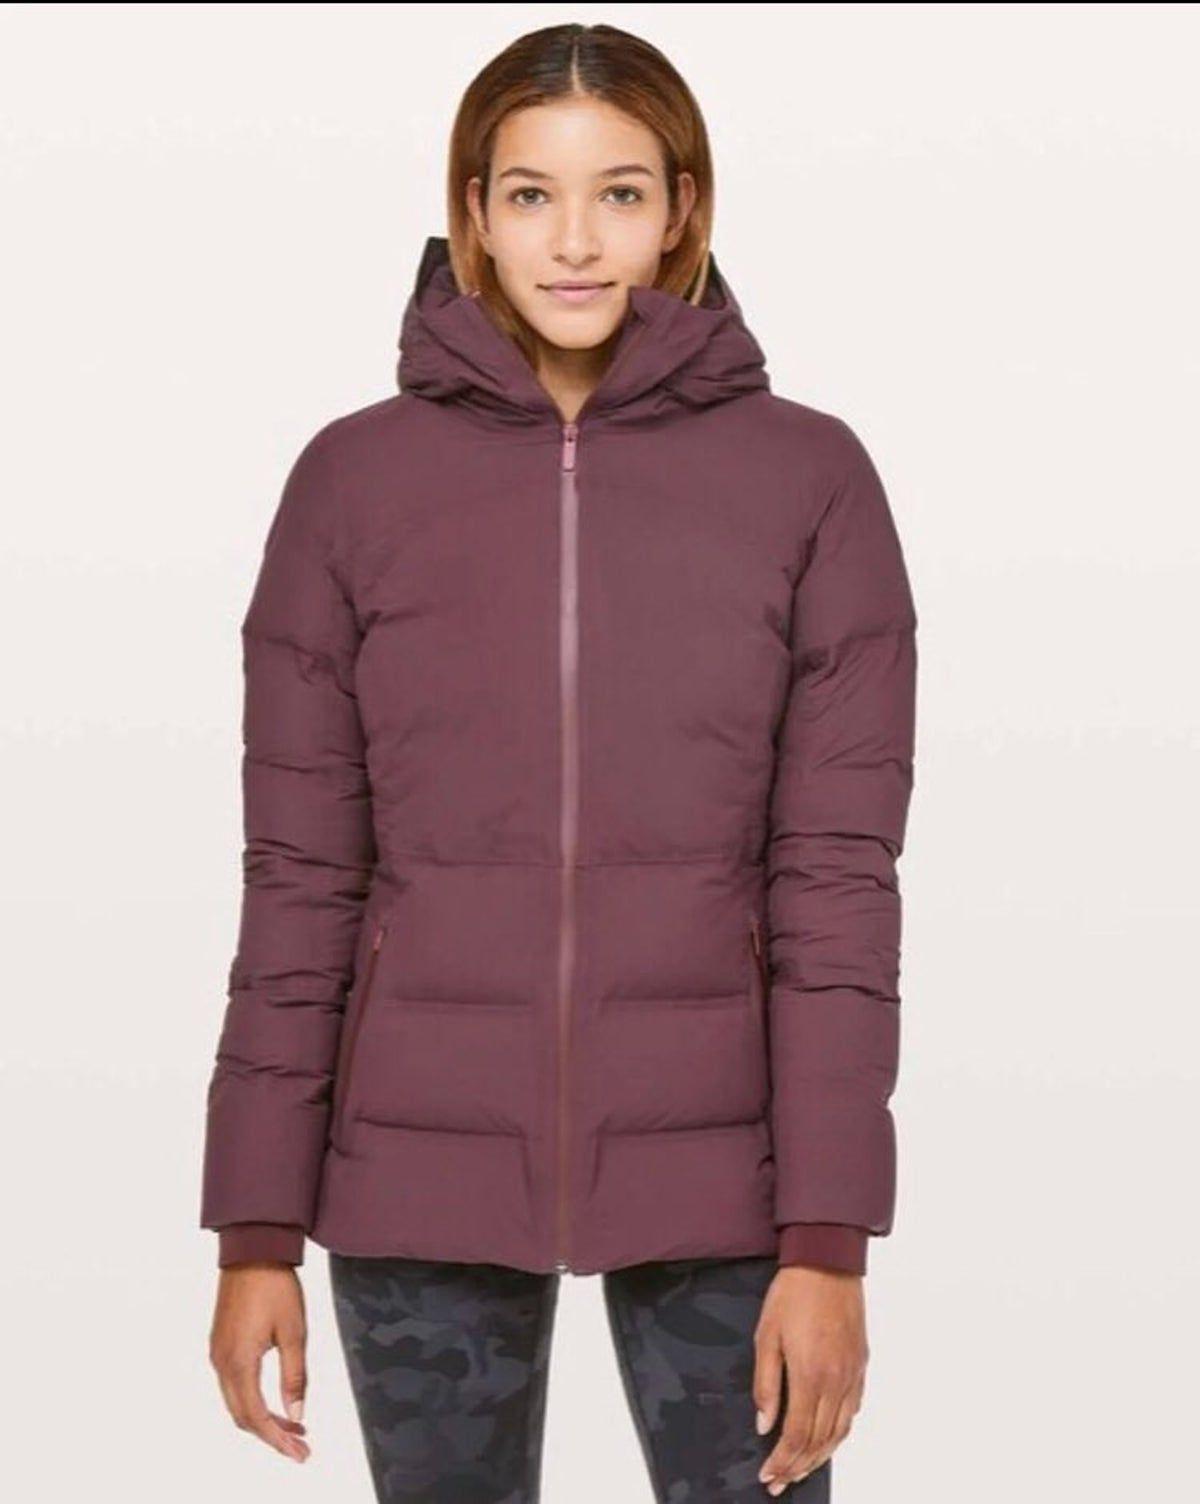 Pin By Dev On Ski Trip Inspo Street Jacket Jackets Technical Clothing [ 1504 x 1200 Pixel ]